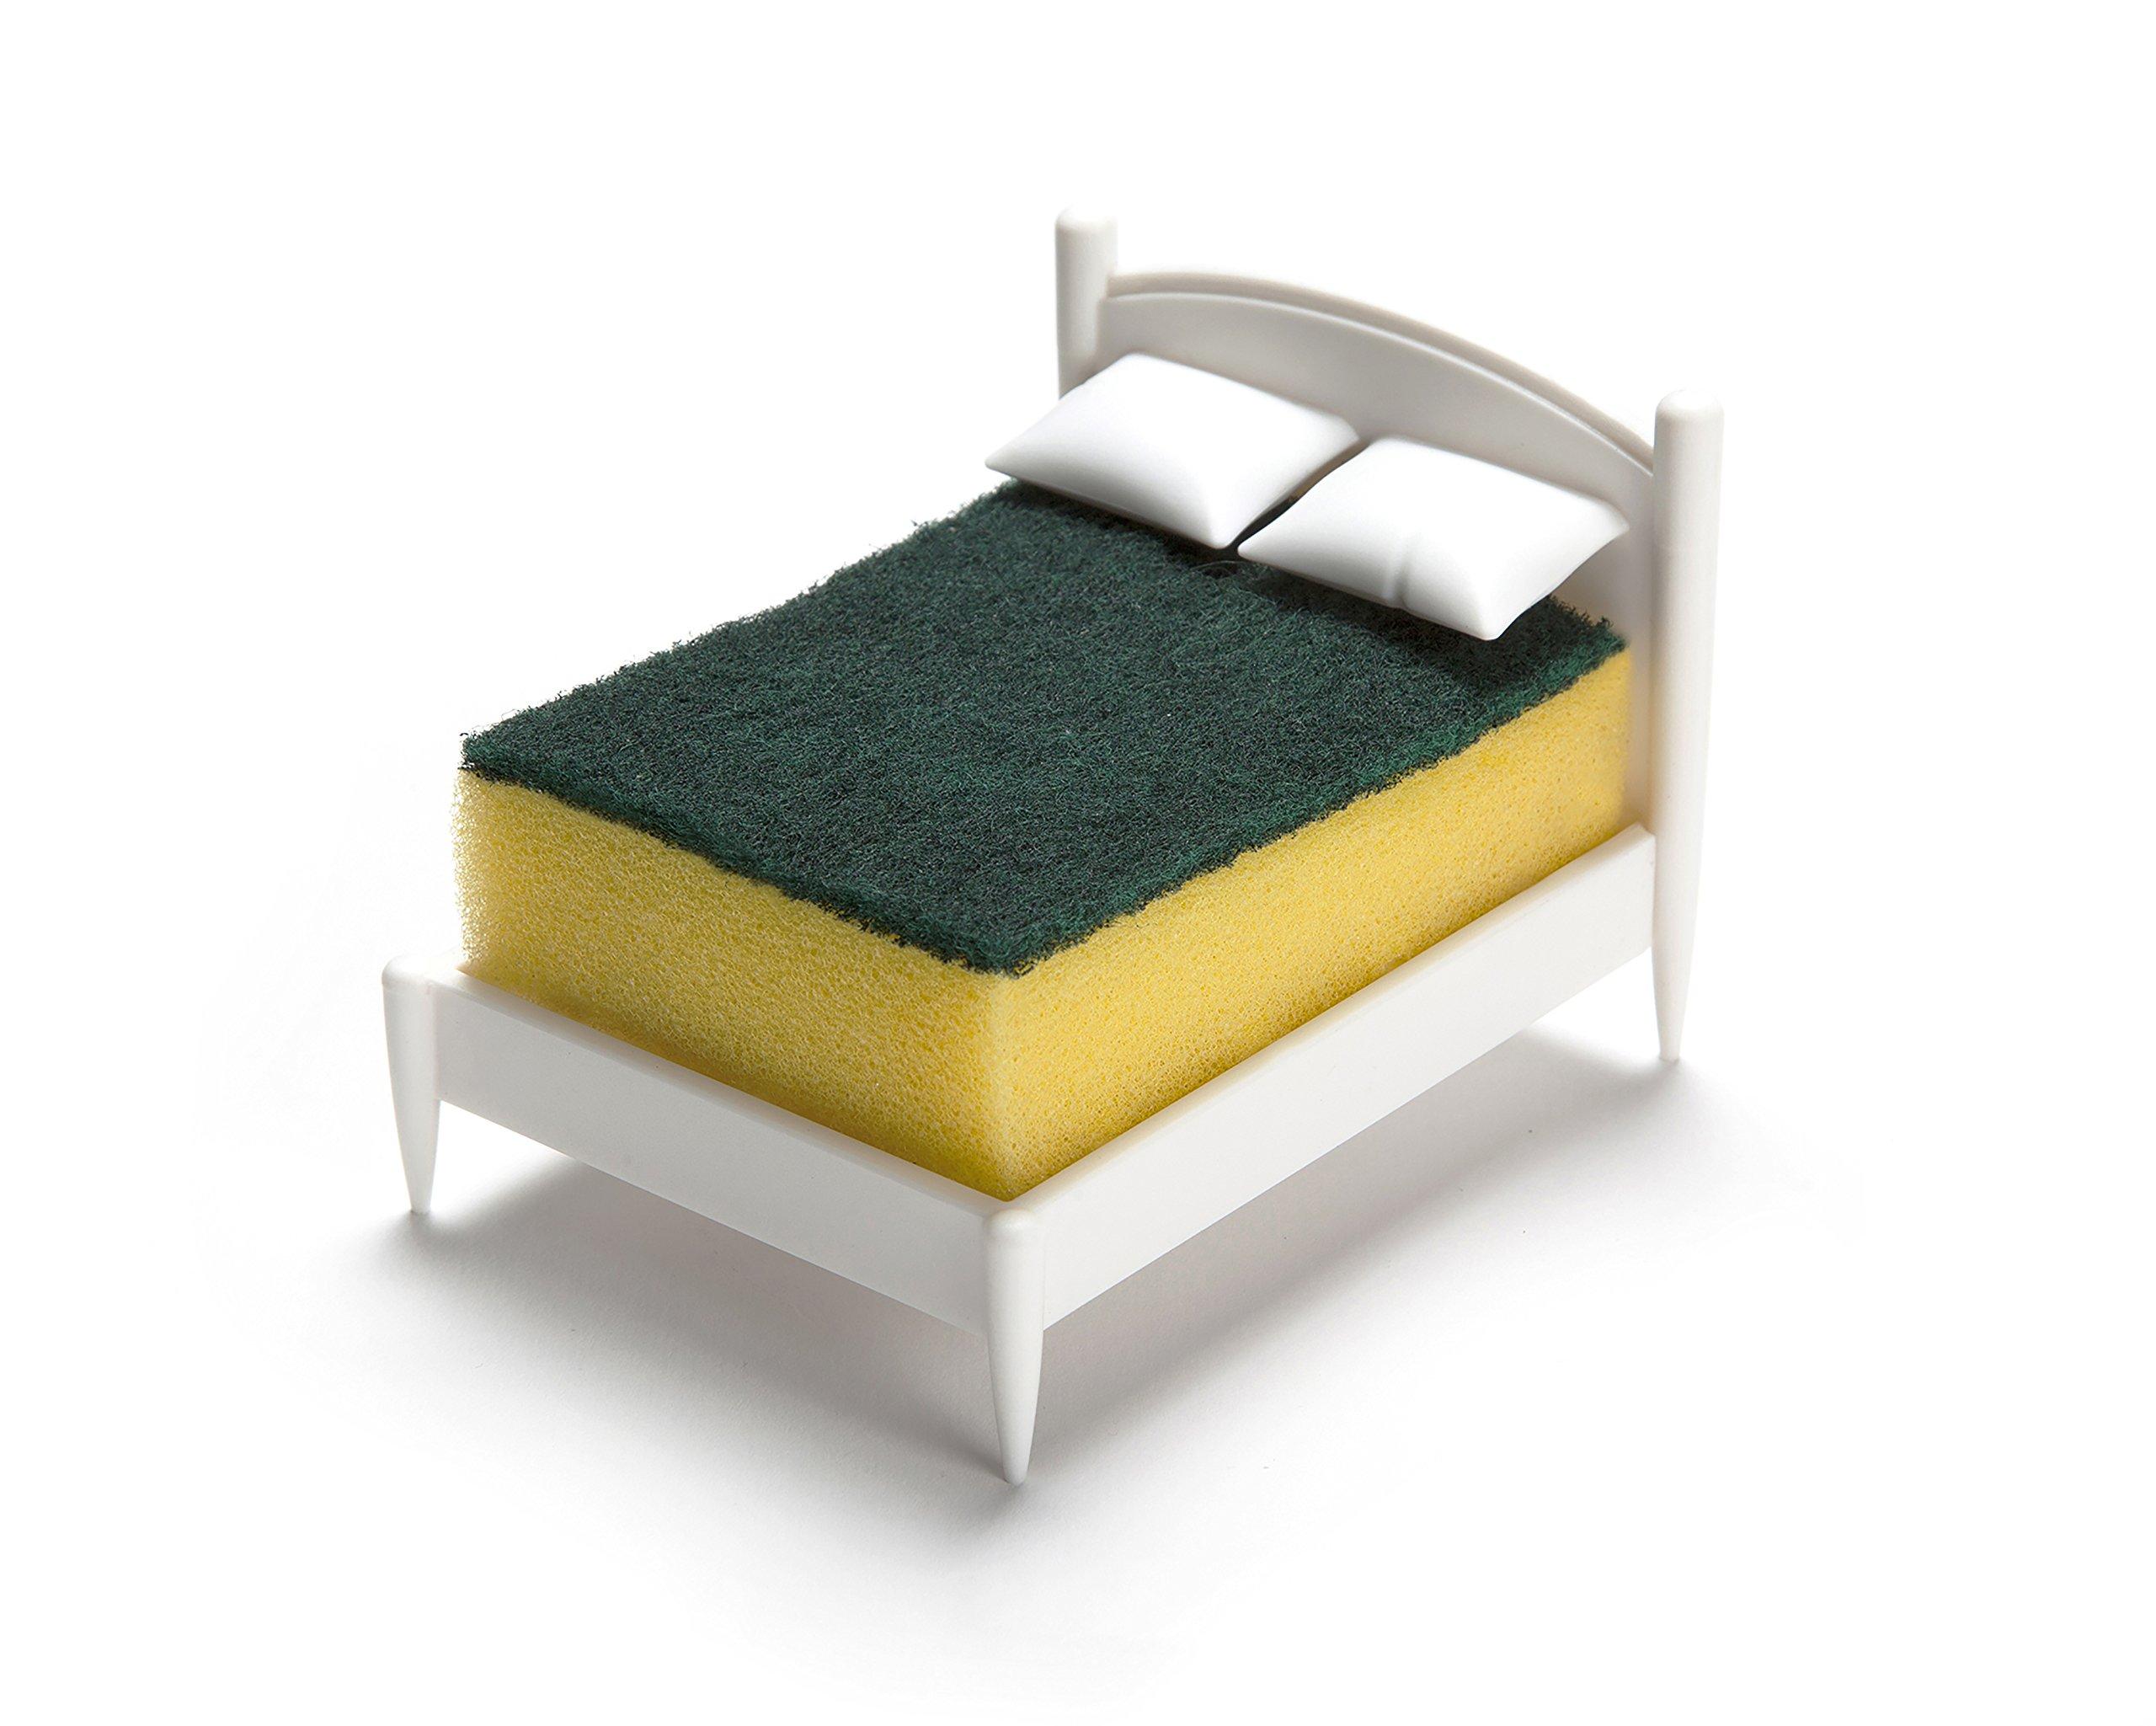 OTOTO Clean Dreams Kitchen Sponge Holder by by Design